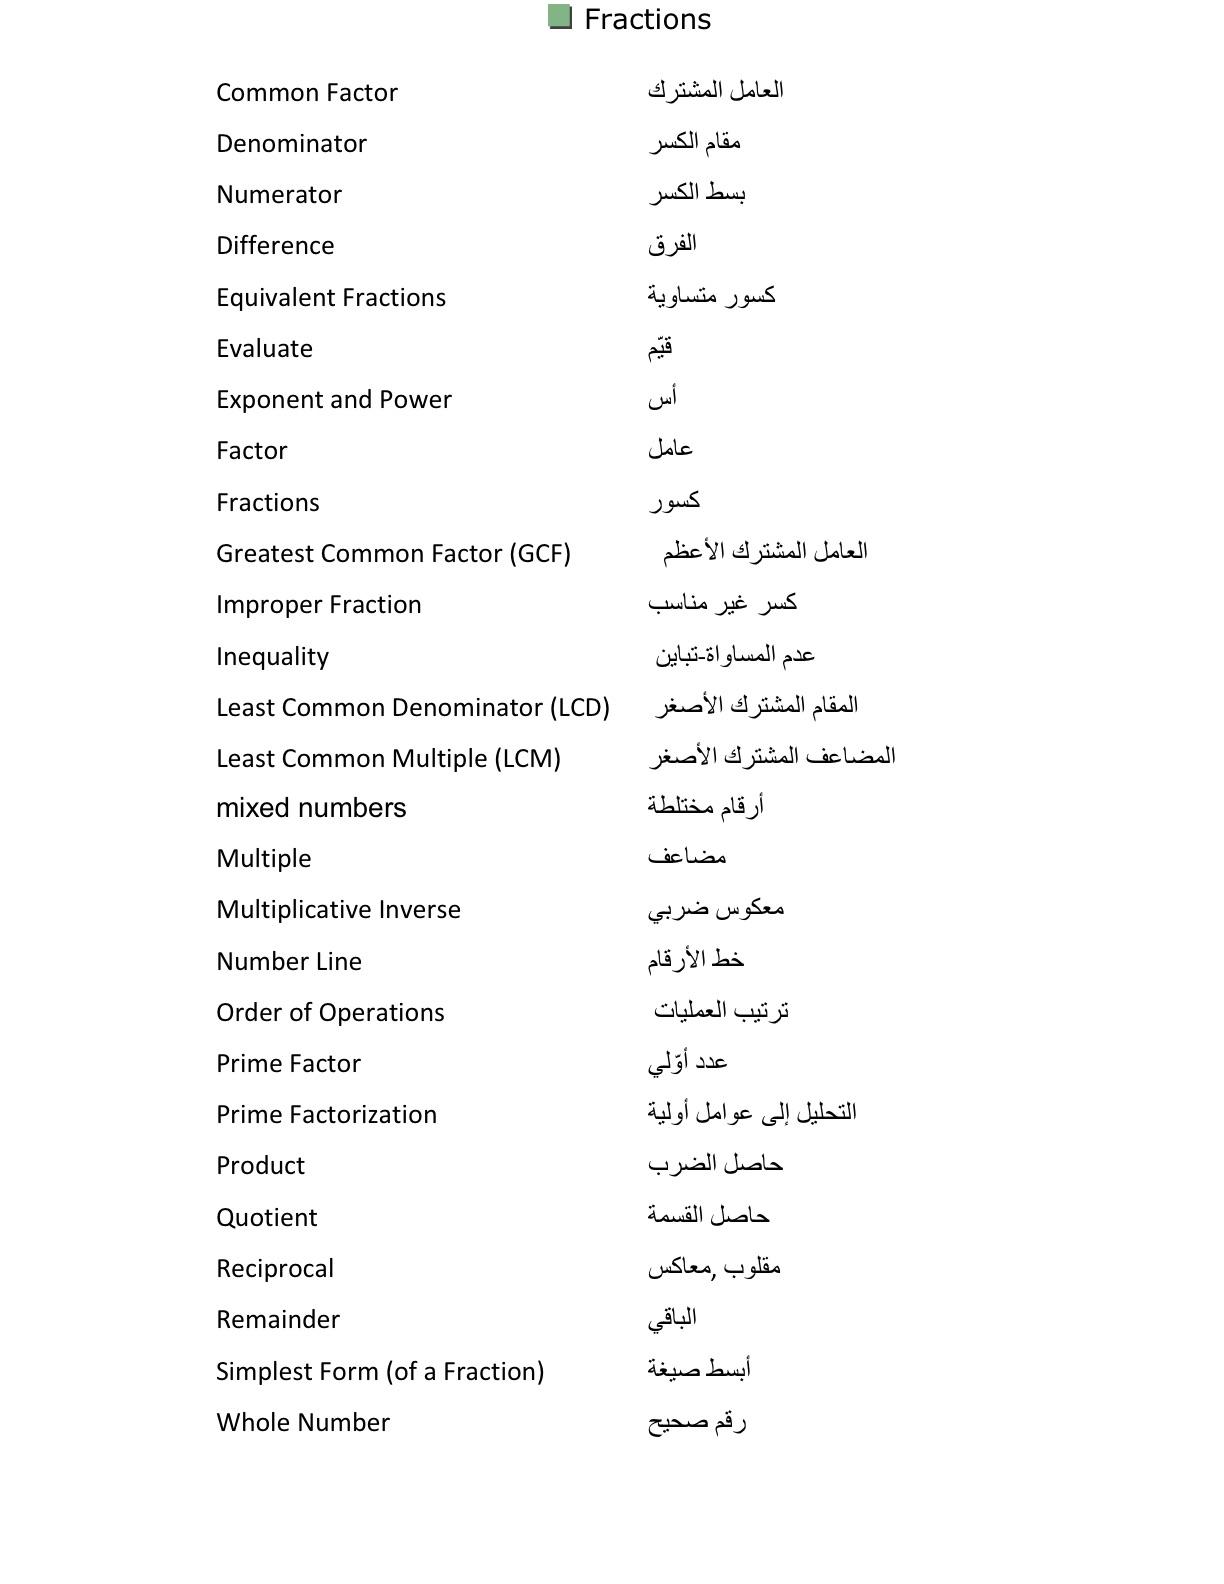 Rak Colleges Fnd Math Math Vocabulary English Arabic